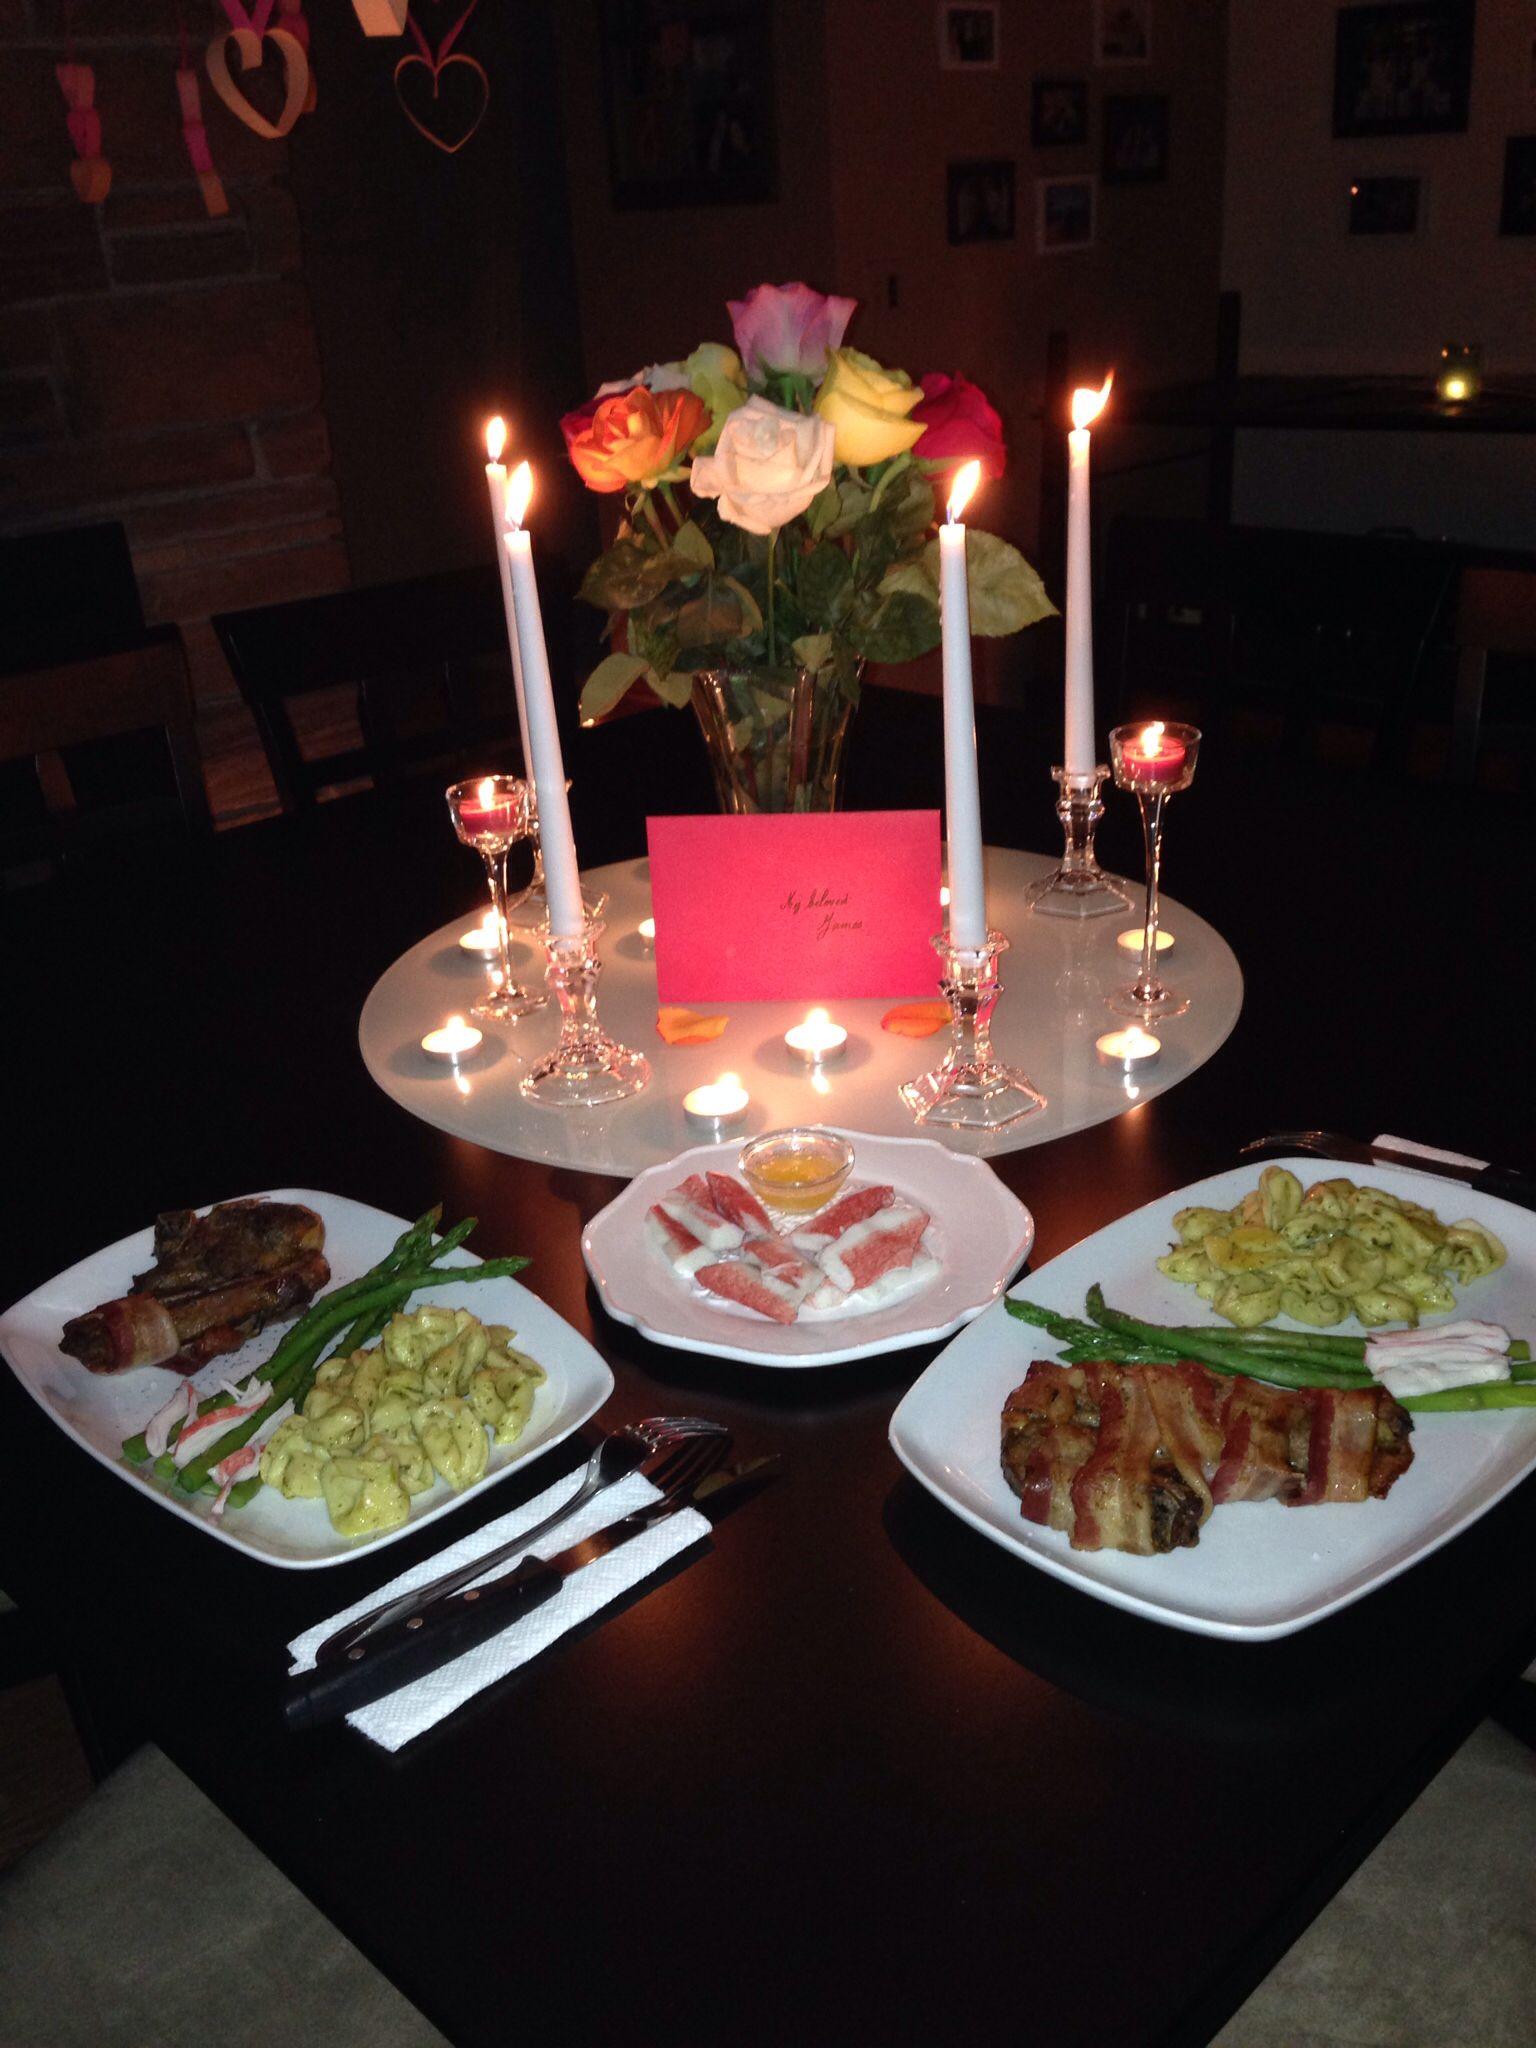 Pin By Vanessa Vu On Candlelight Dinner Romantic Dinner Setting